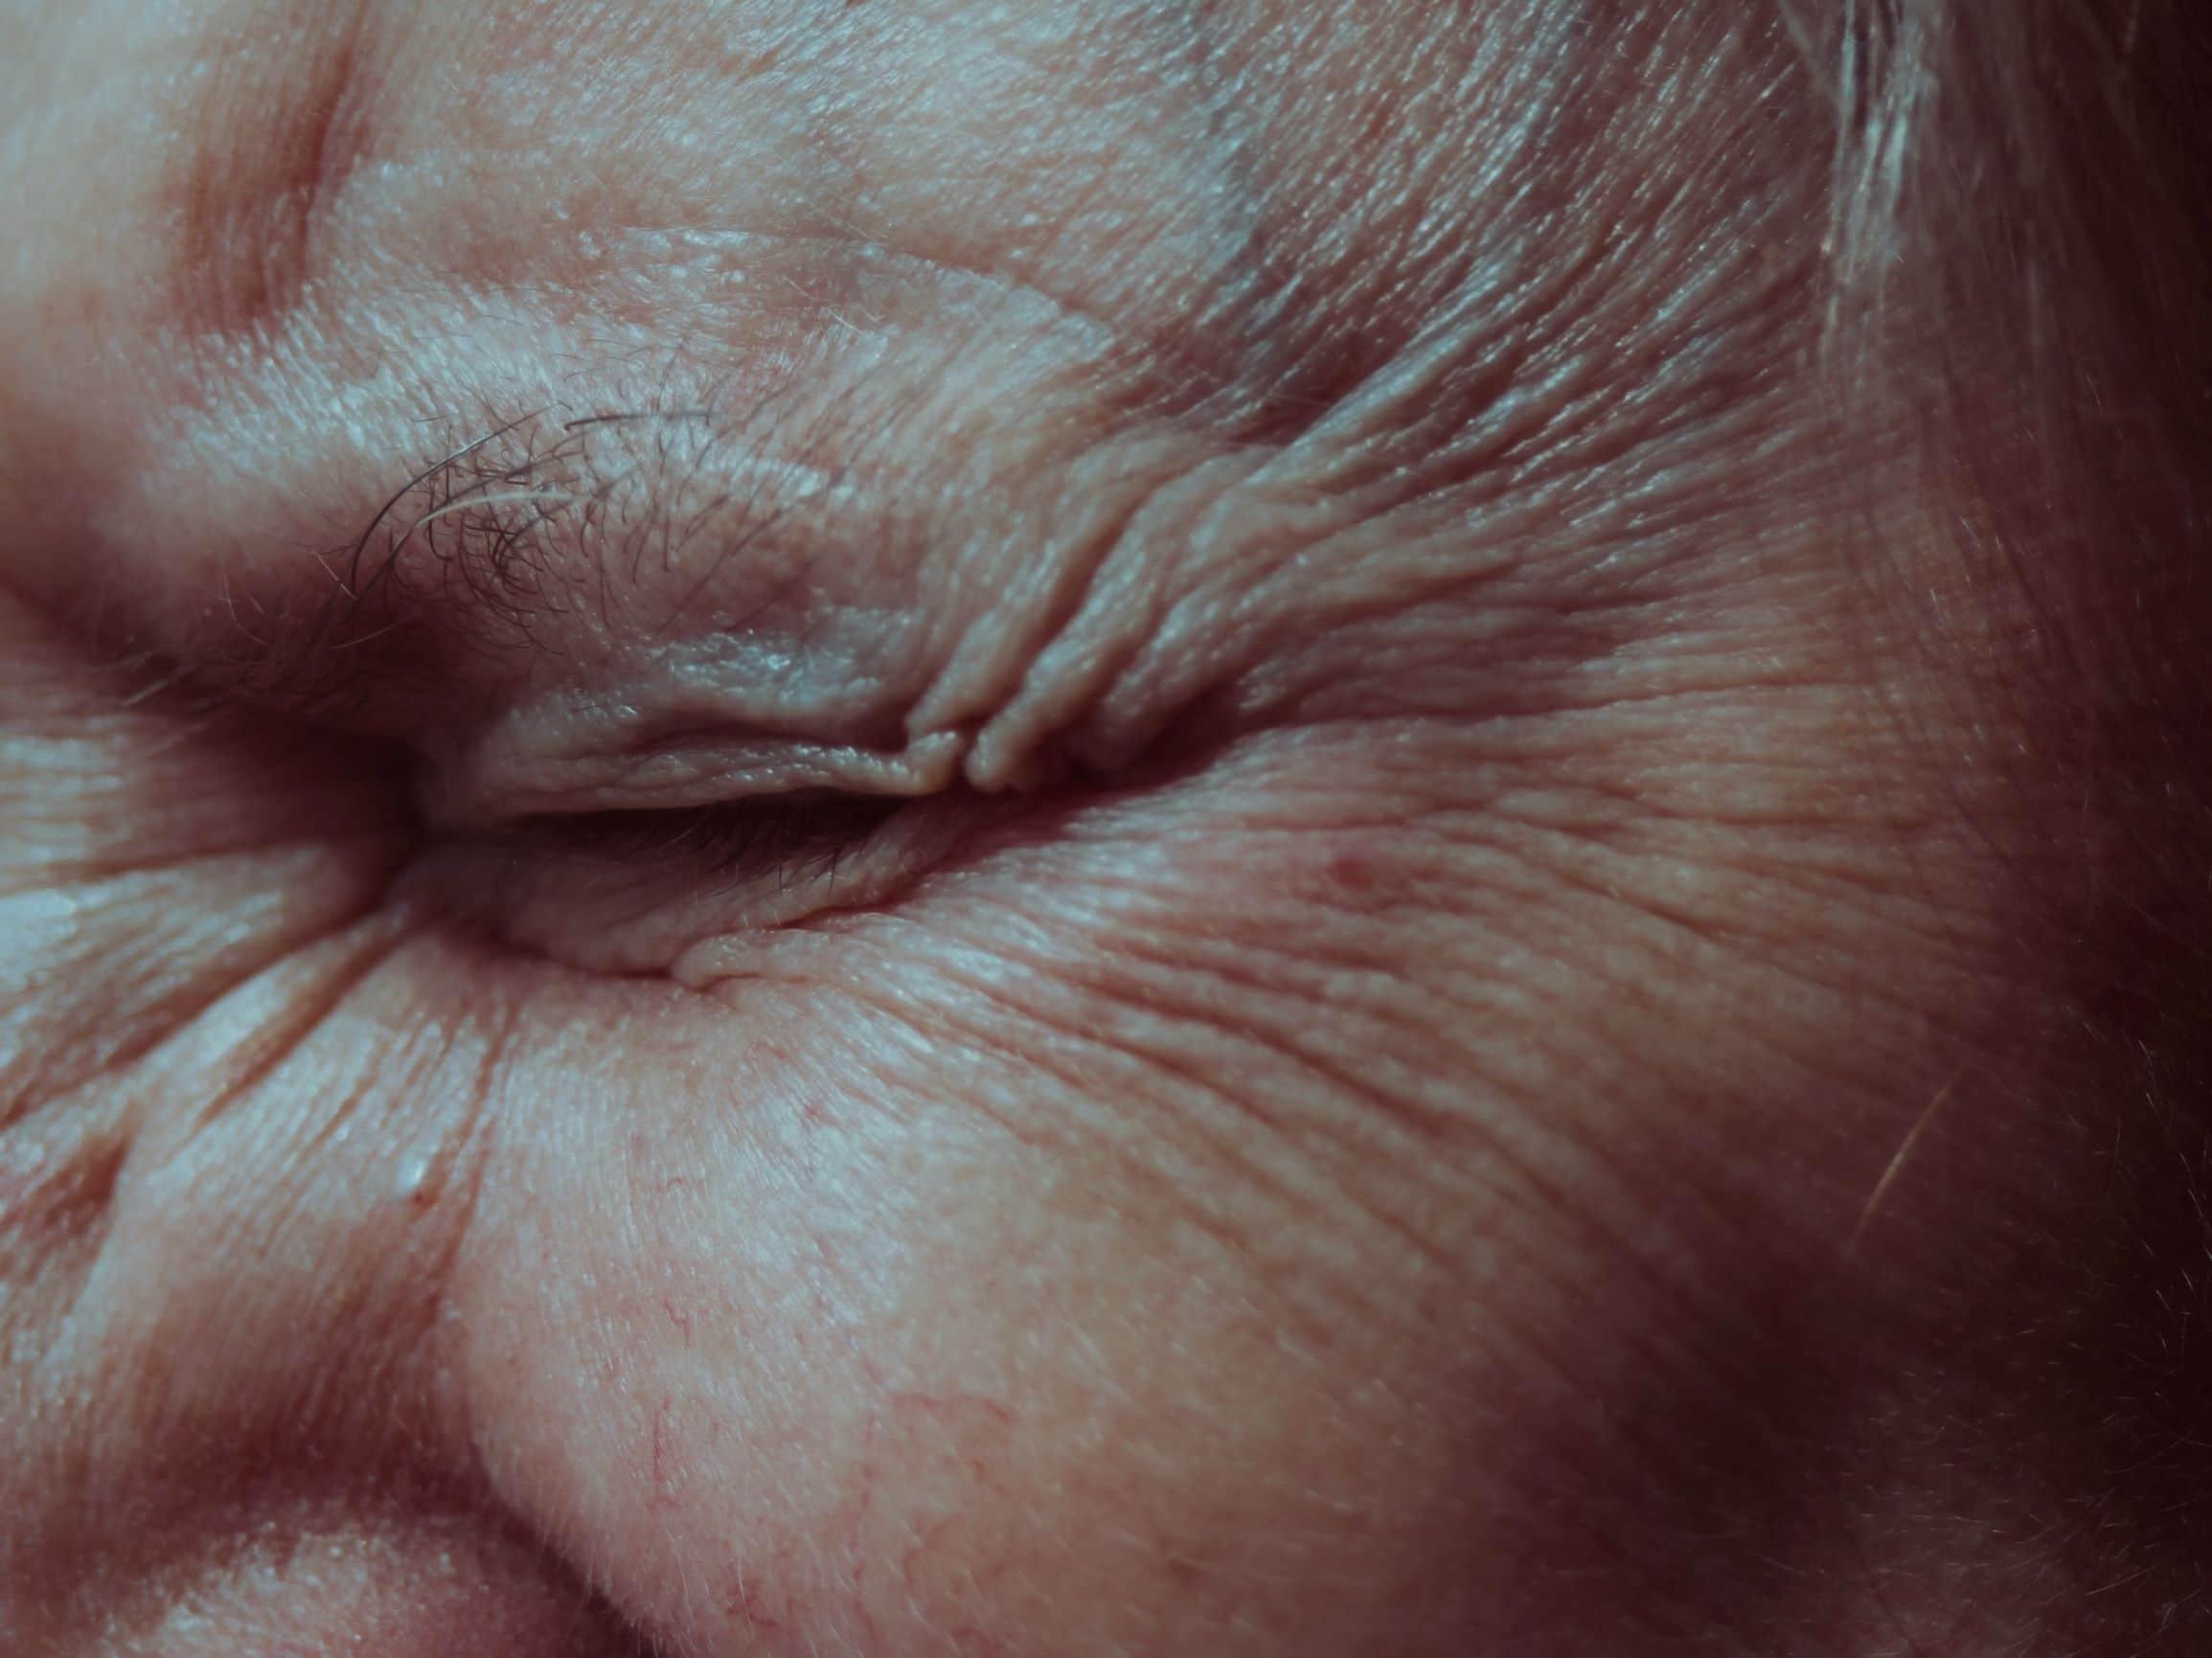 wrinkles and skin aging caused by lack of sleep